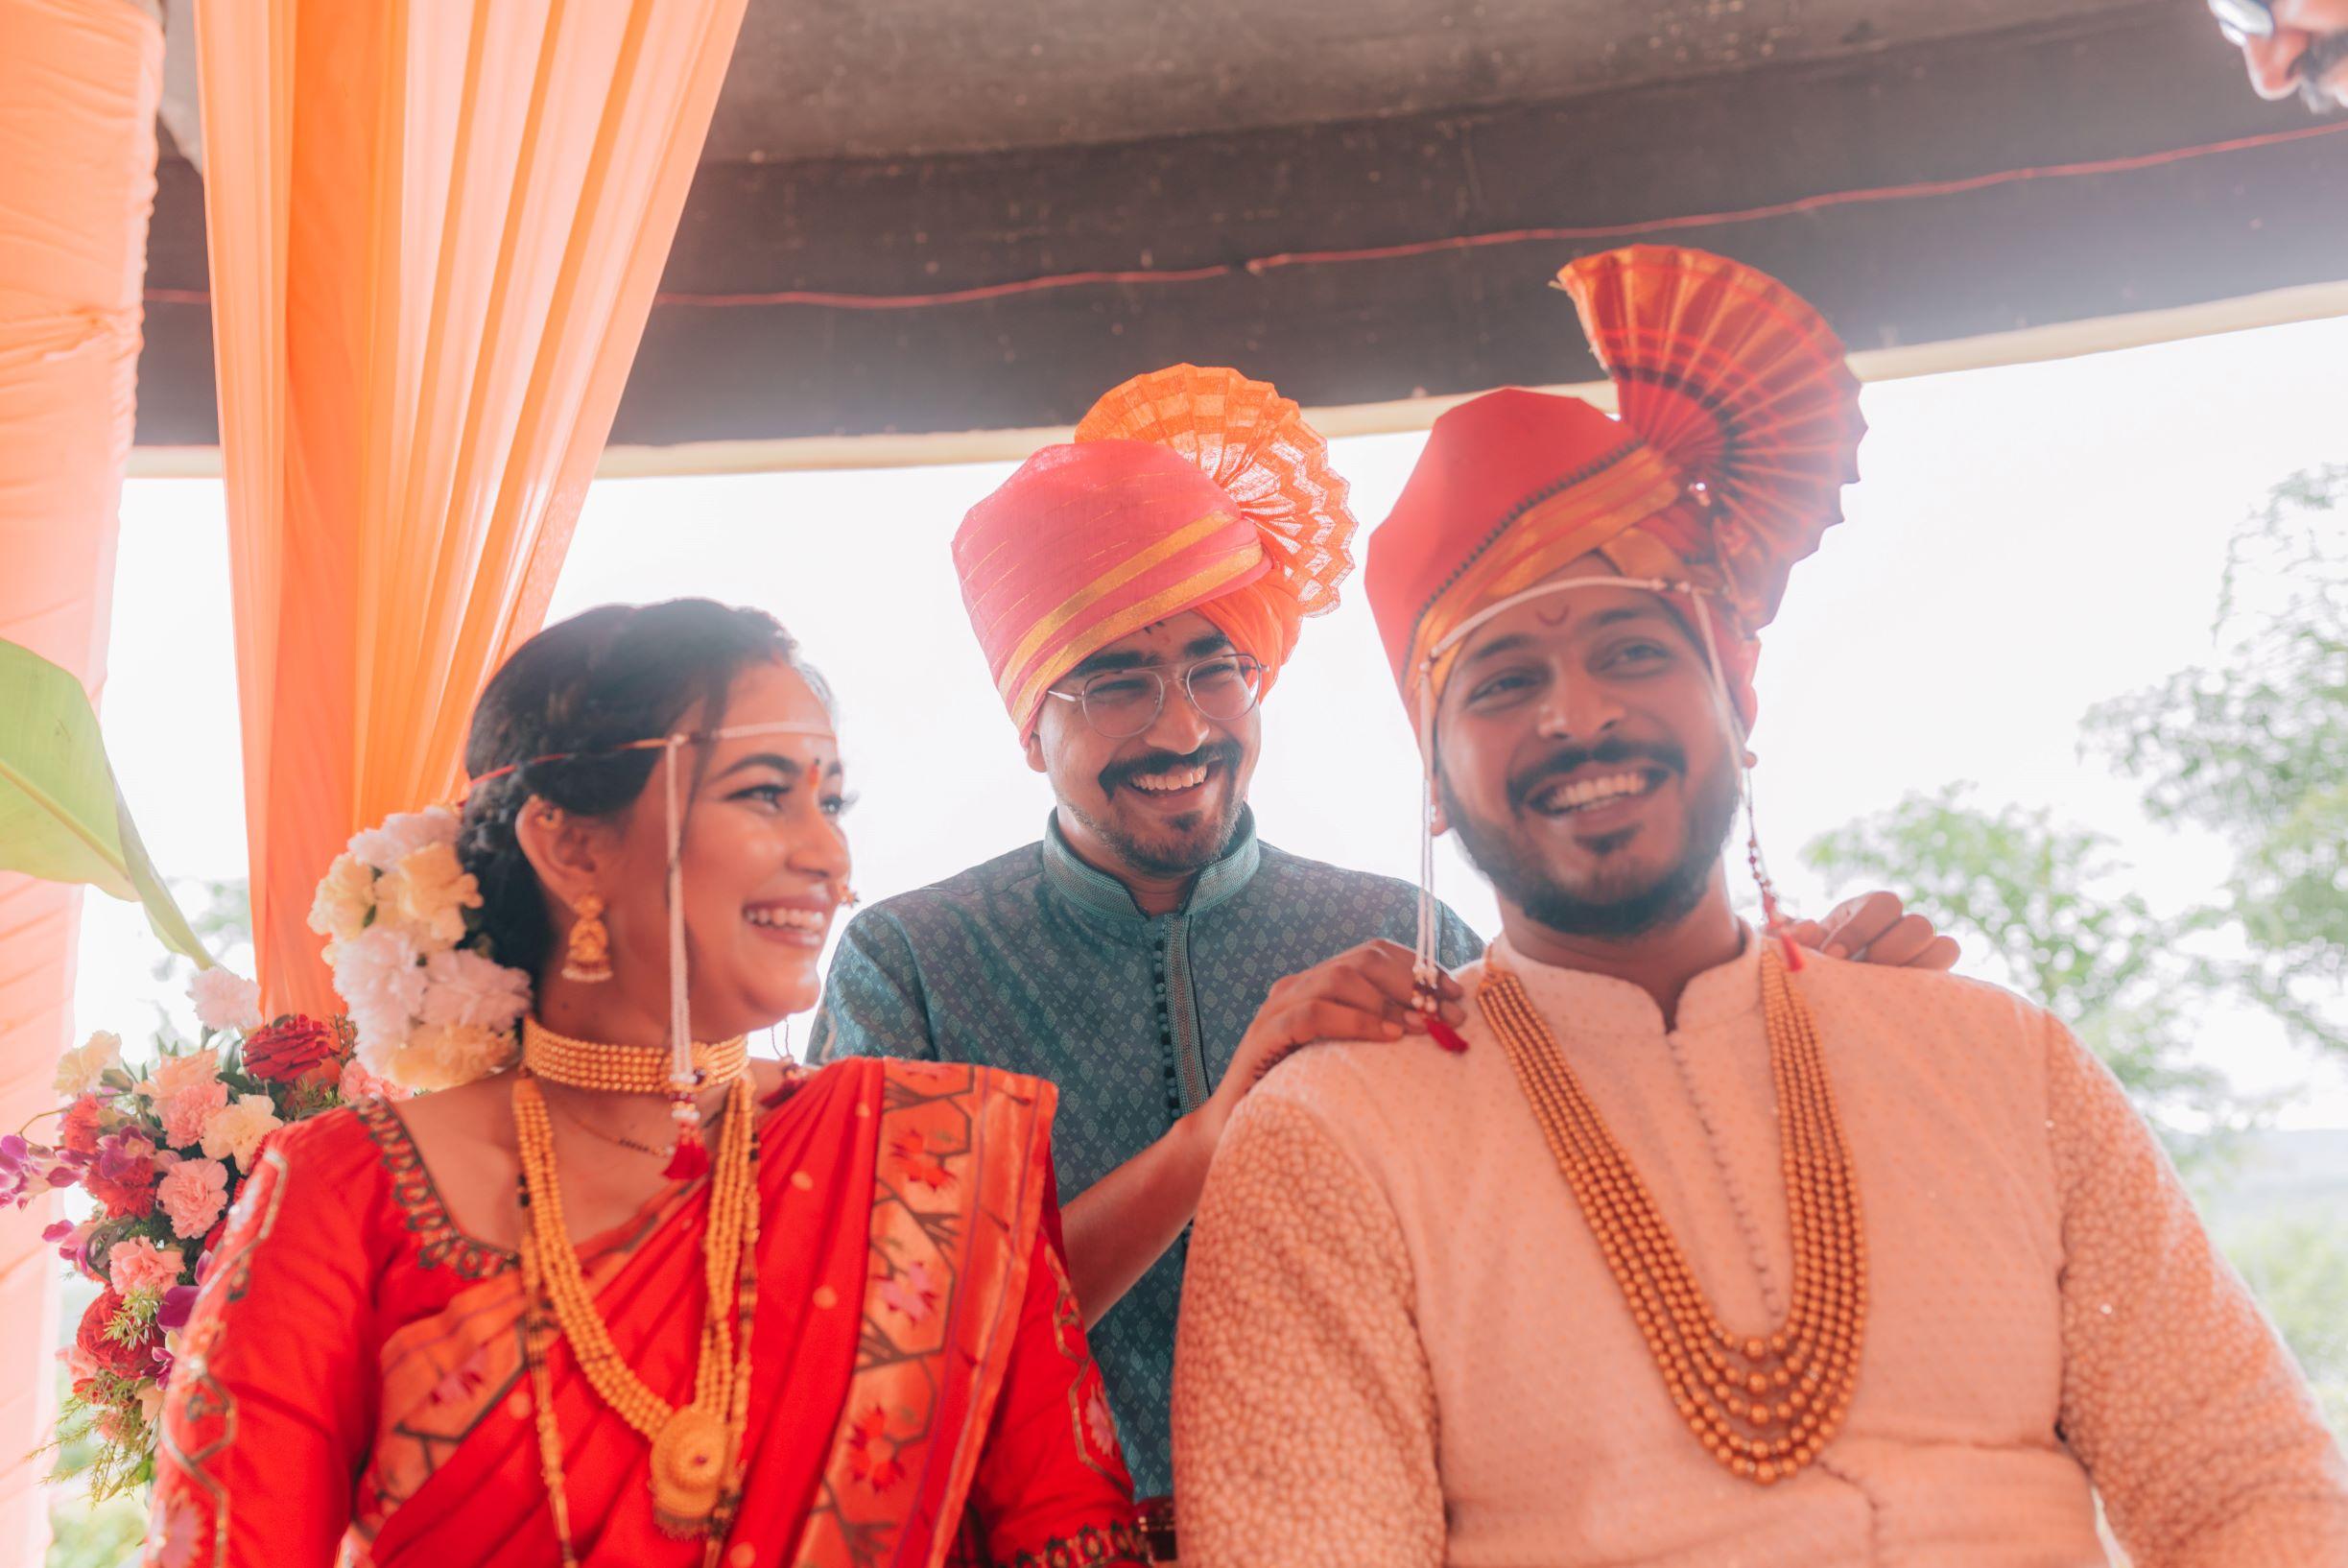 maharashtrian couple in orange traditonal outfits